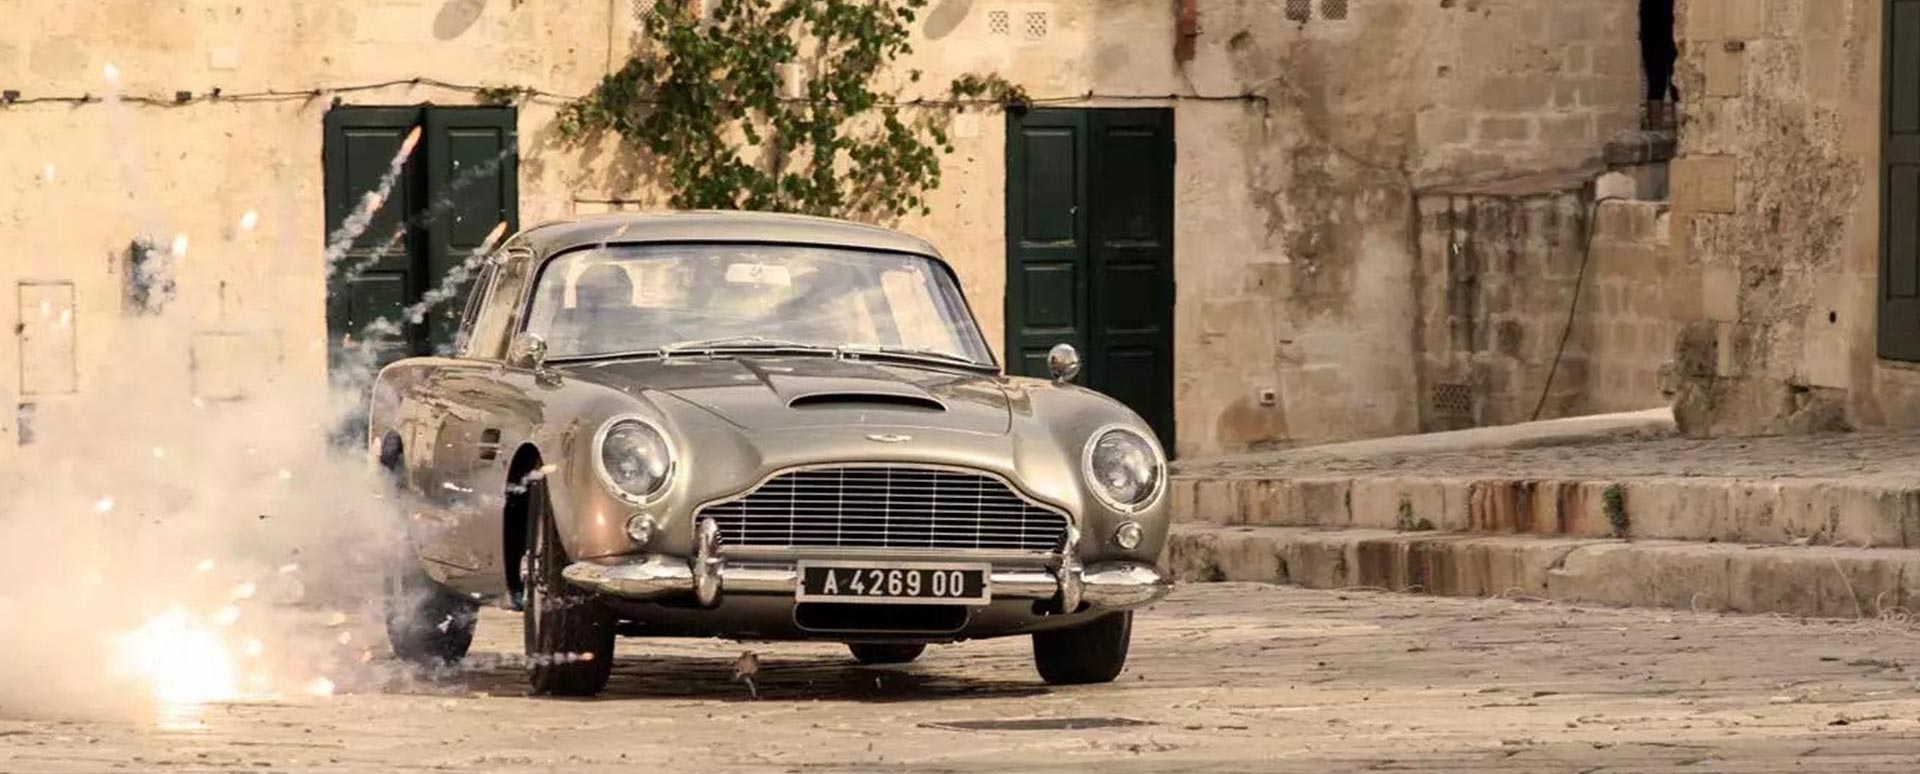 Aston Martin DB5 on James Bond set